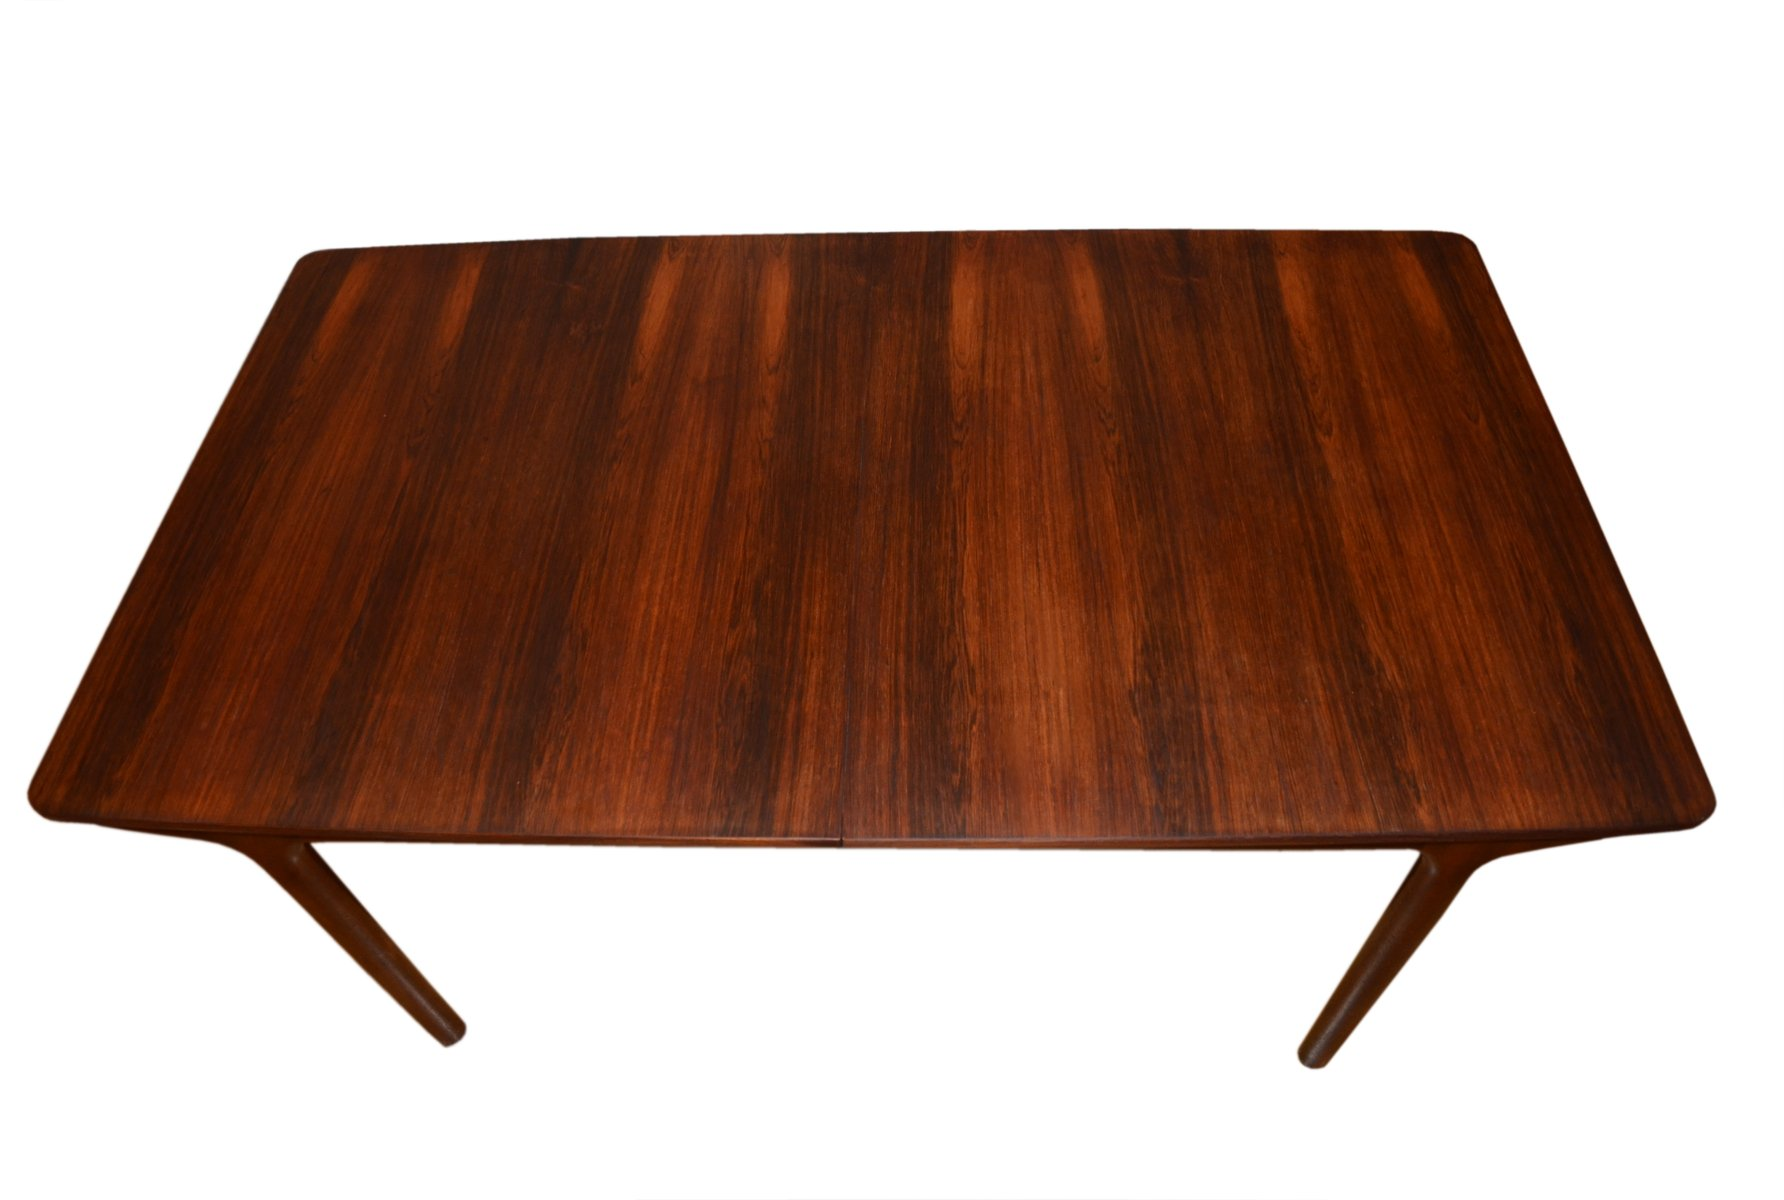 grande table de salle manger rallonge mid century 12. Black Bedroom Furniture Sets. Home Design Ideas